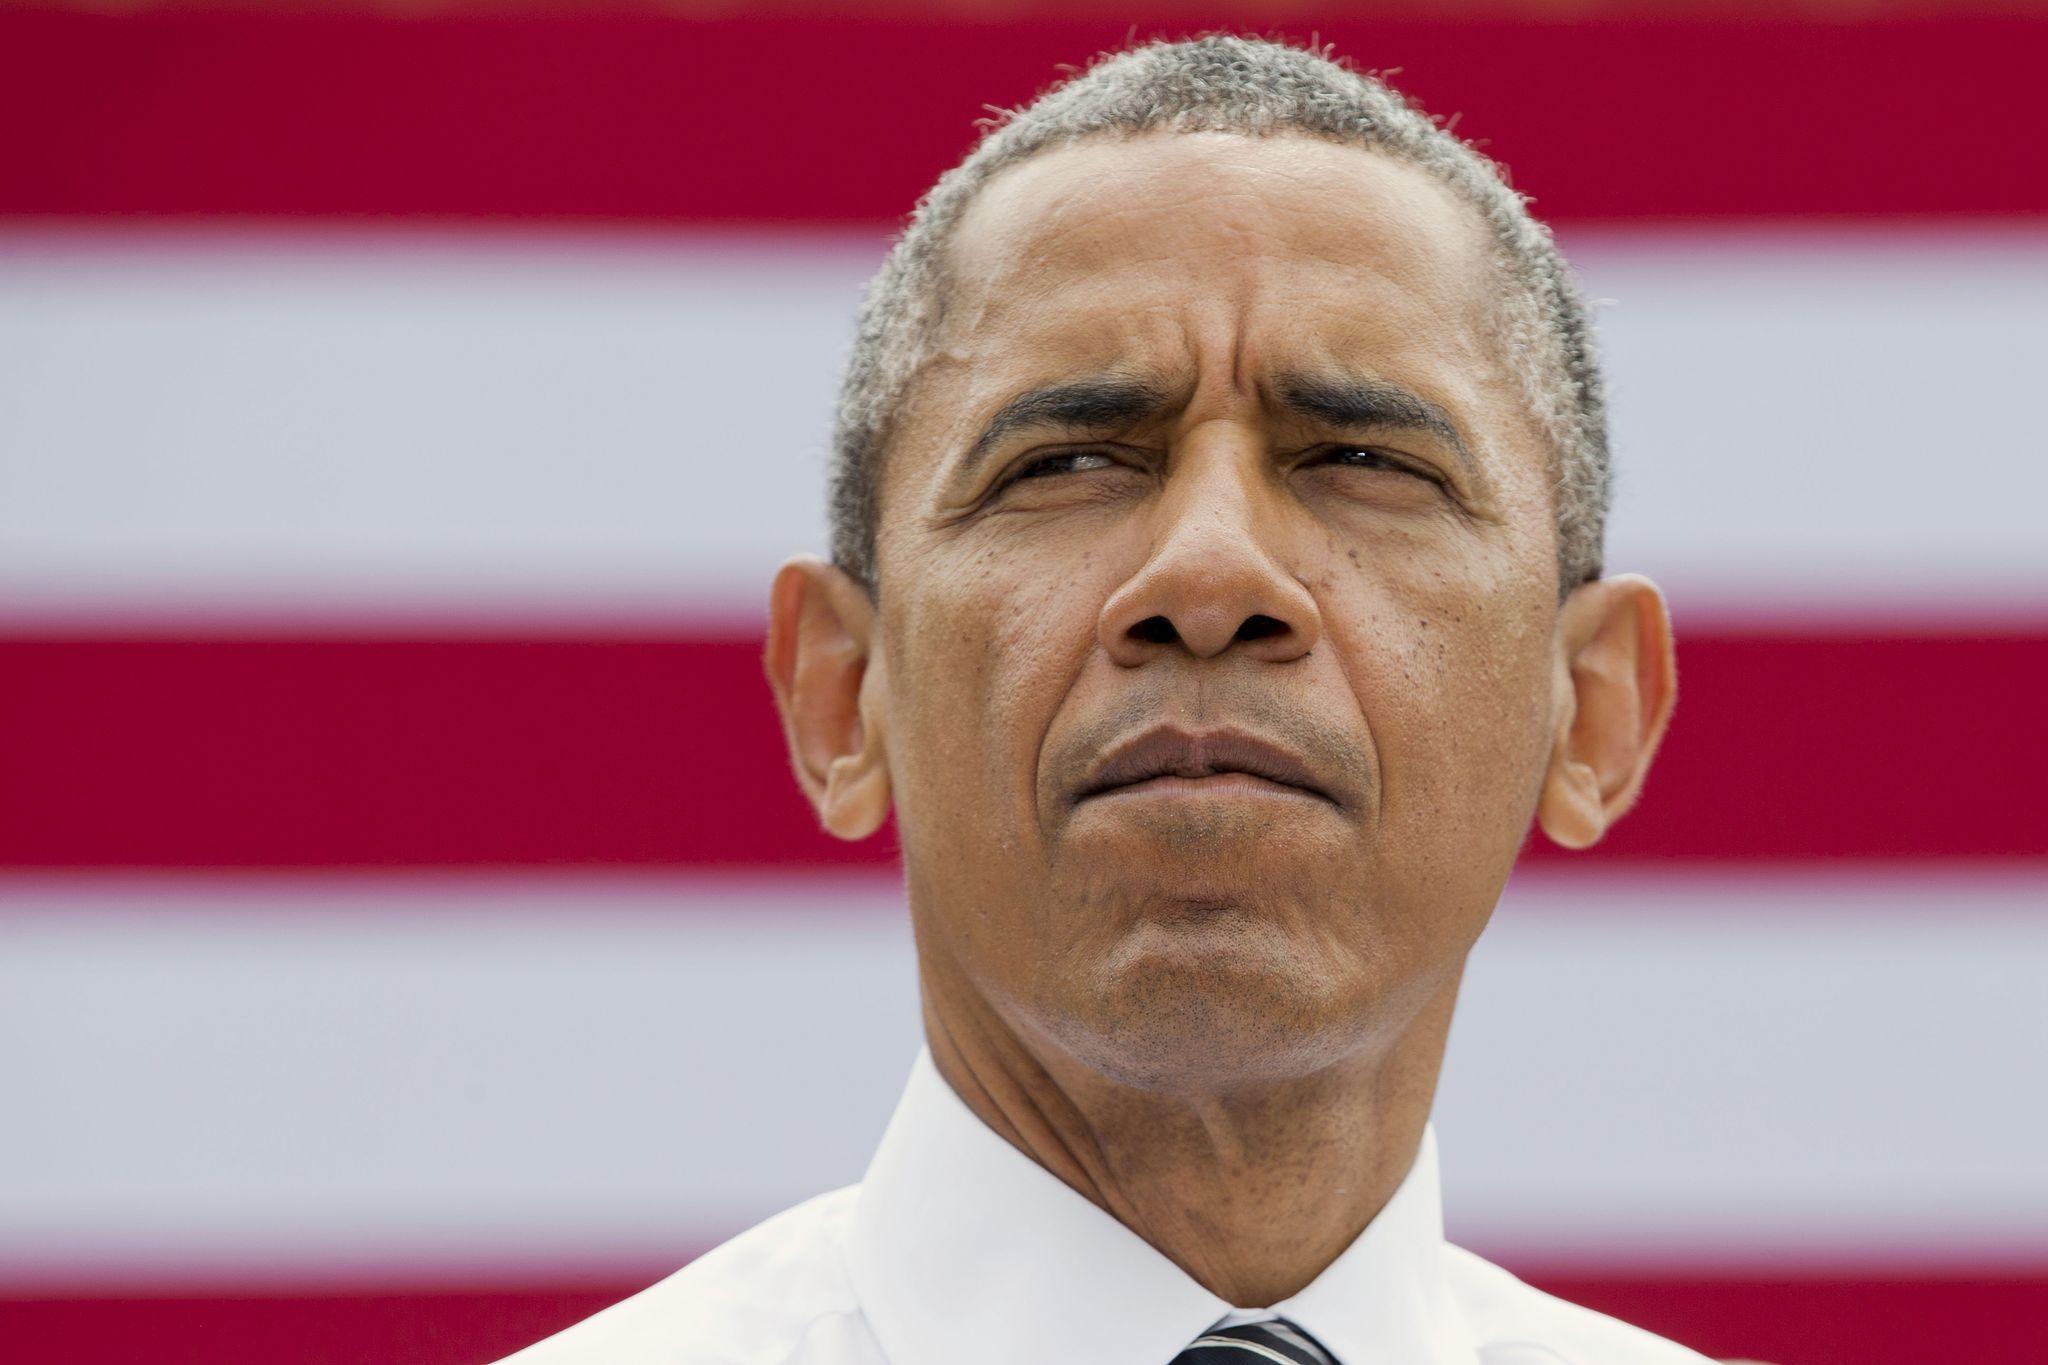 Quite Barack obama pussy lawn jockey